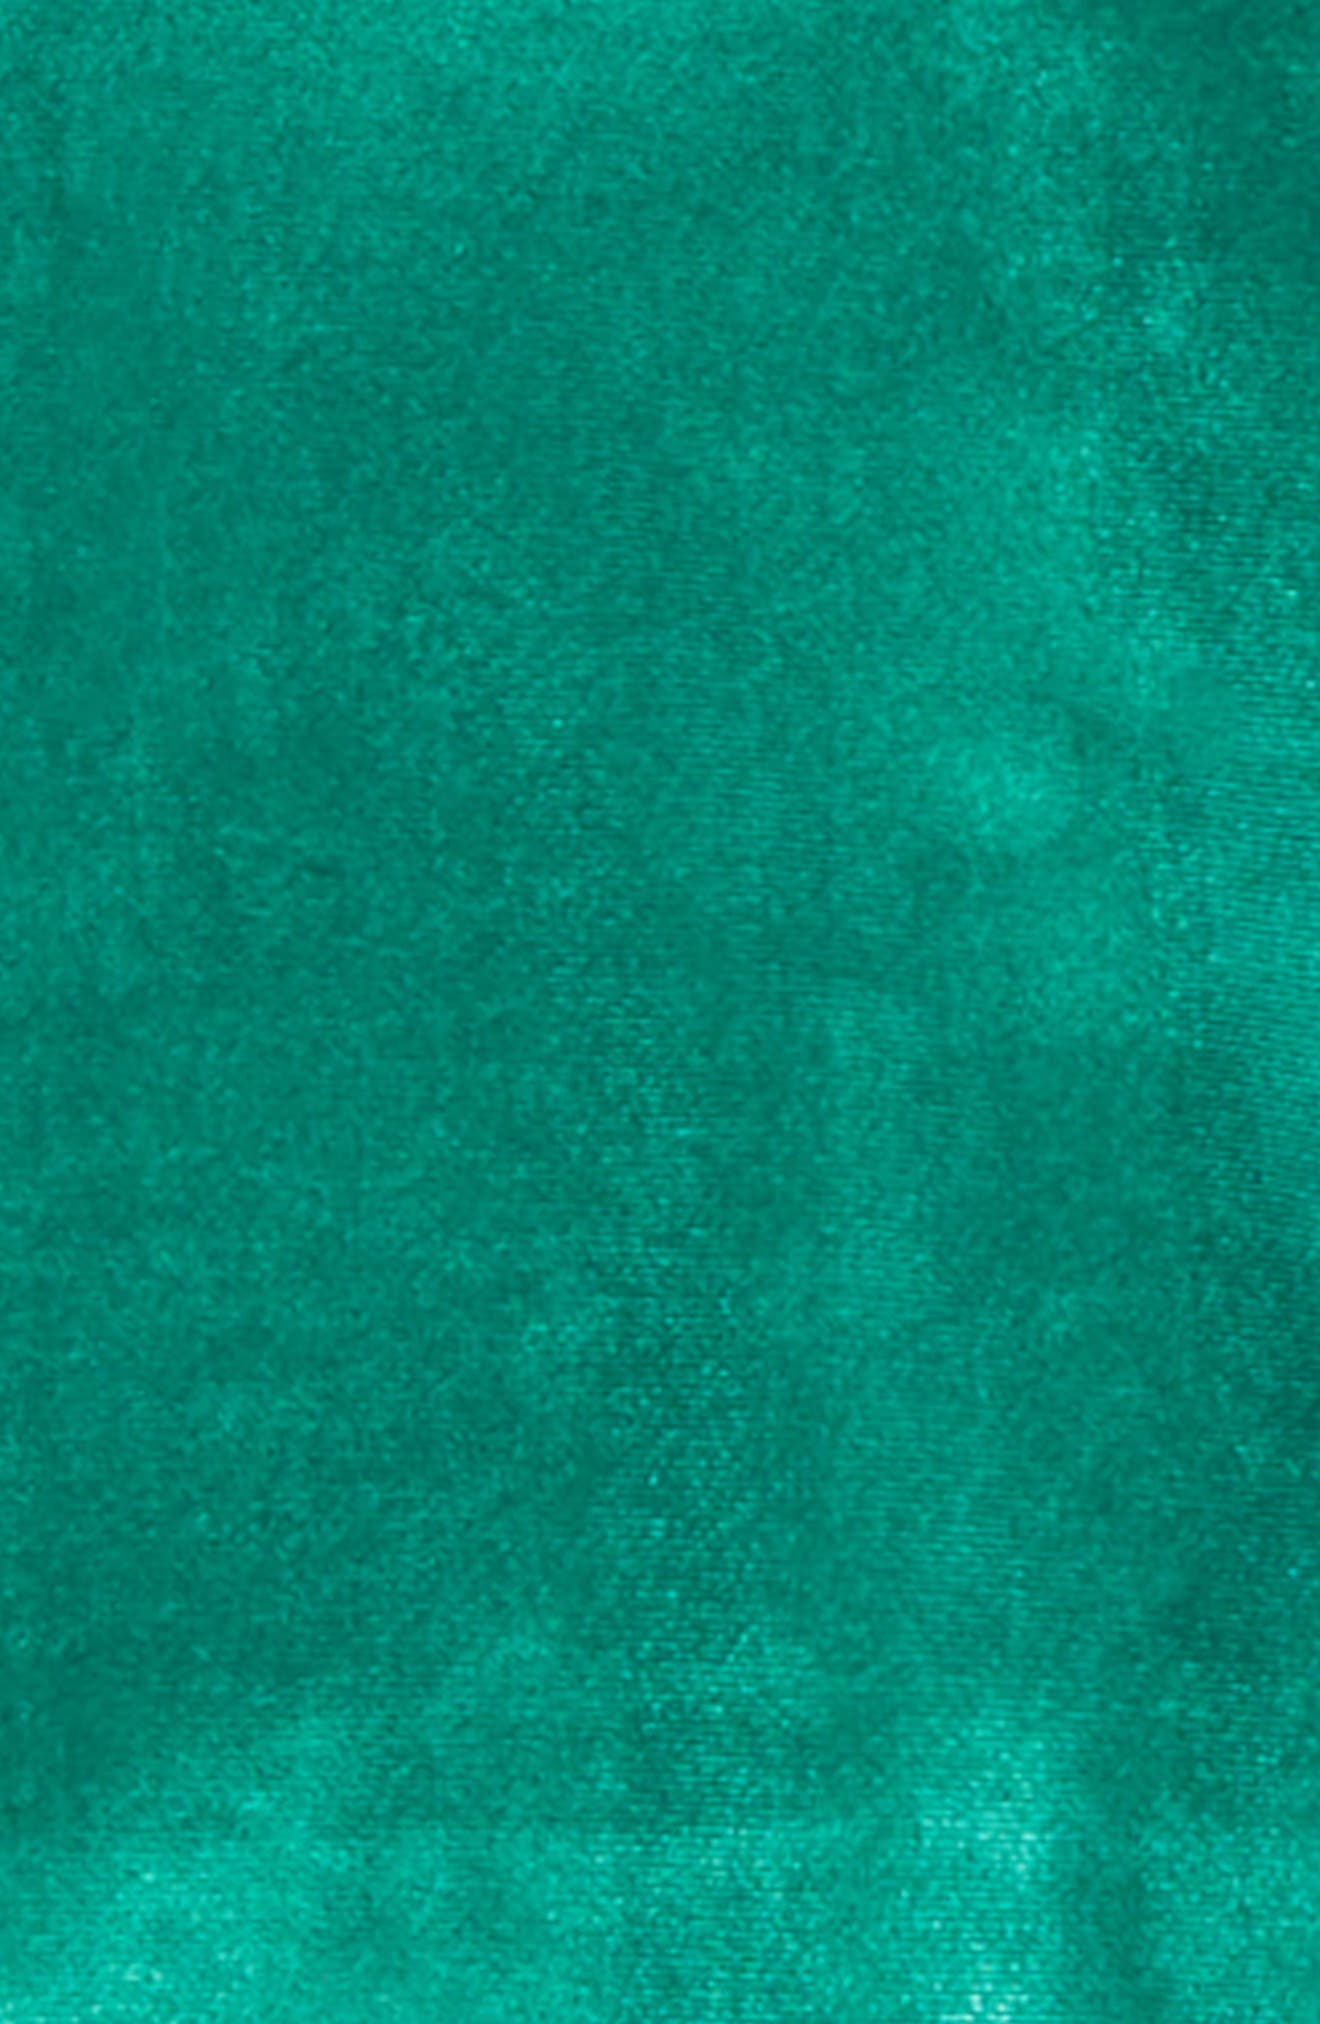 Bubble Sleeve Velour Top,                             Alternate thumbnail 2, color,                             GREEN GOLF